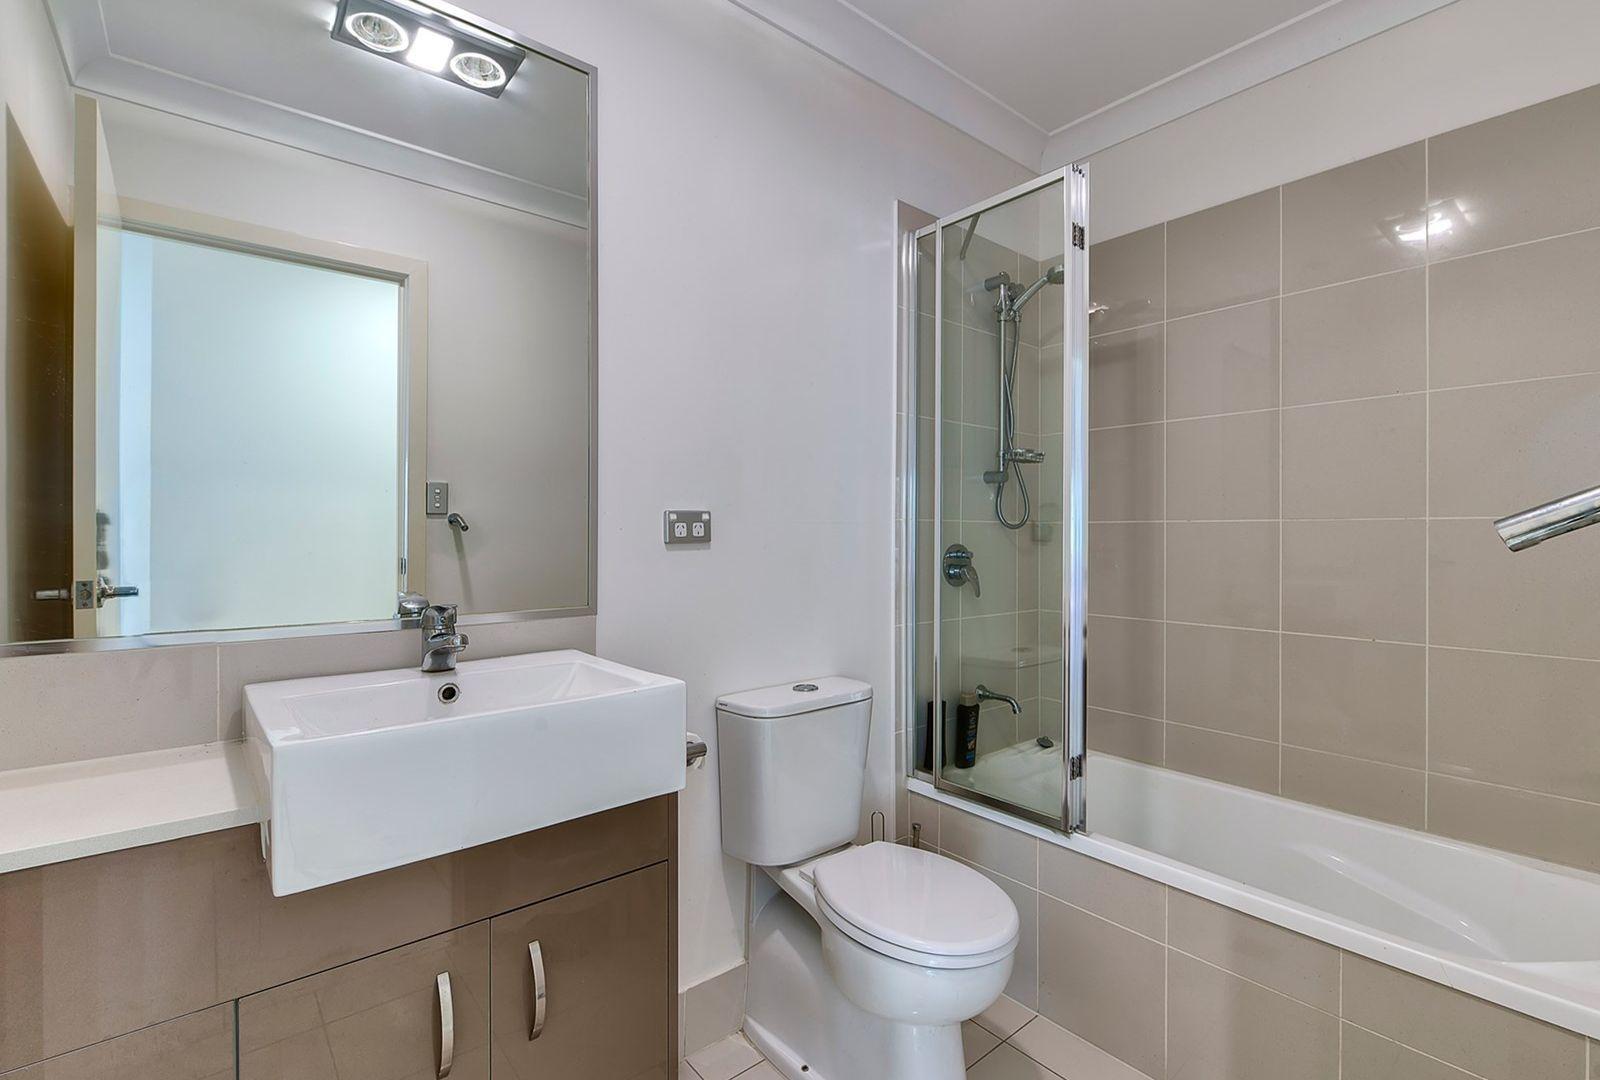 3/53 Douglas Street, Greenslopes QLD 4120, Image 2